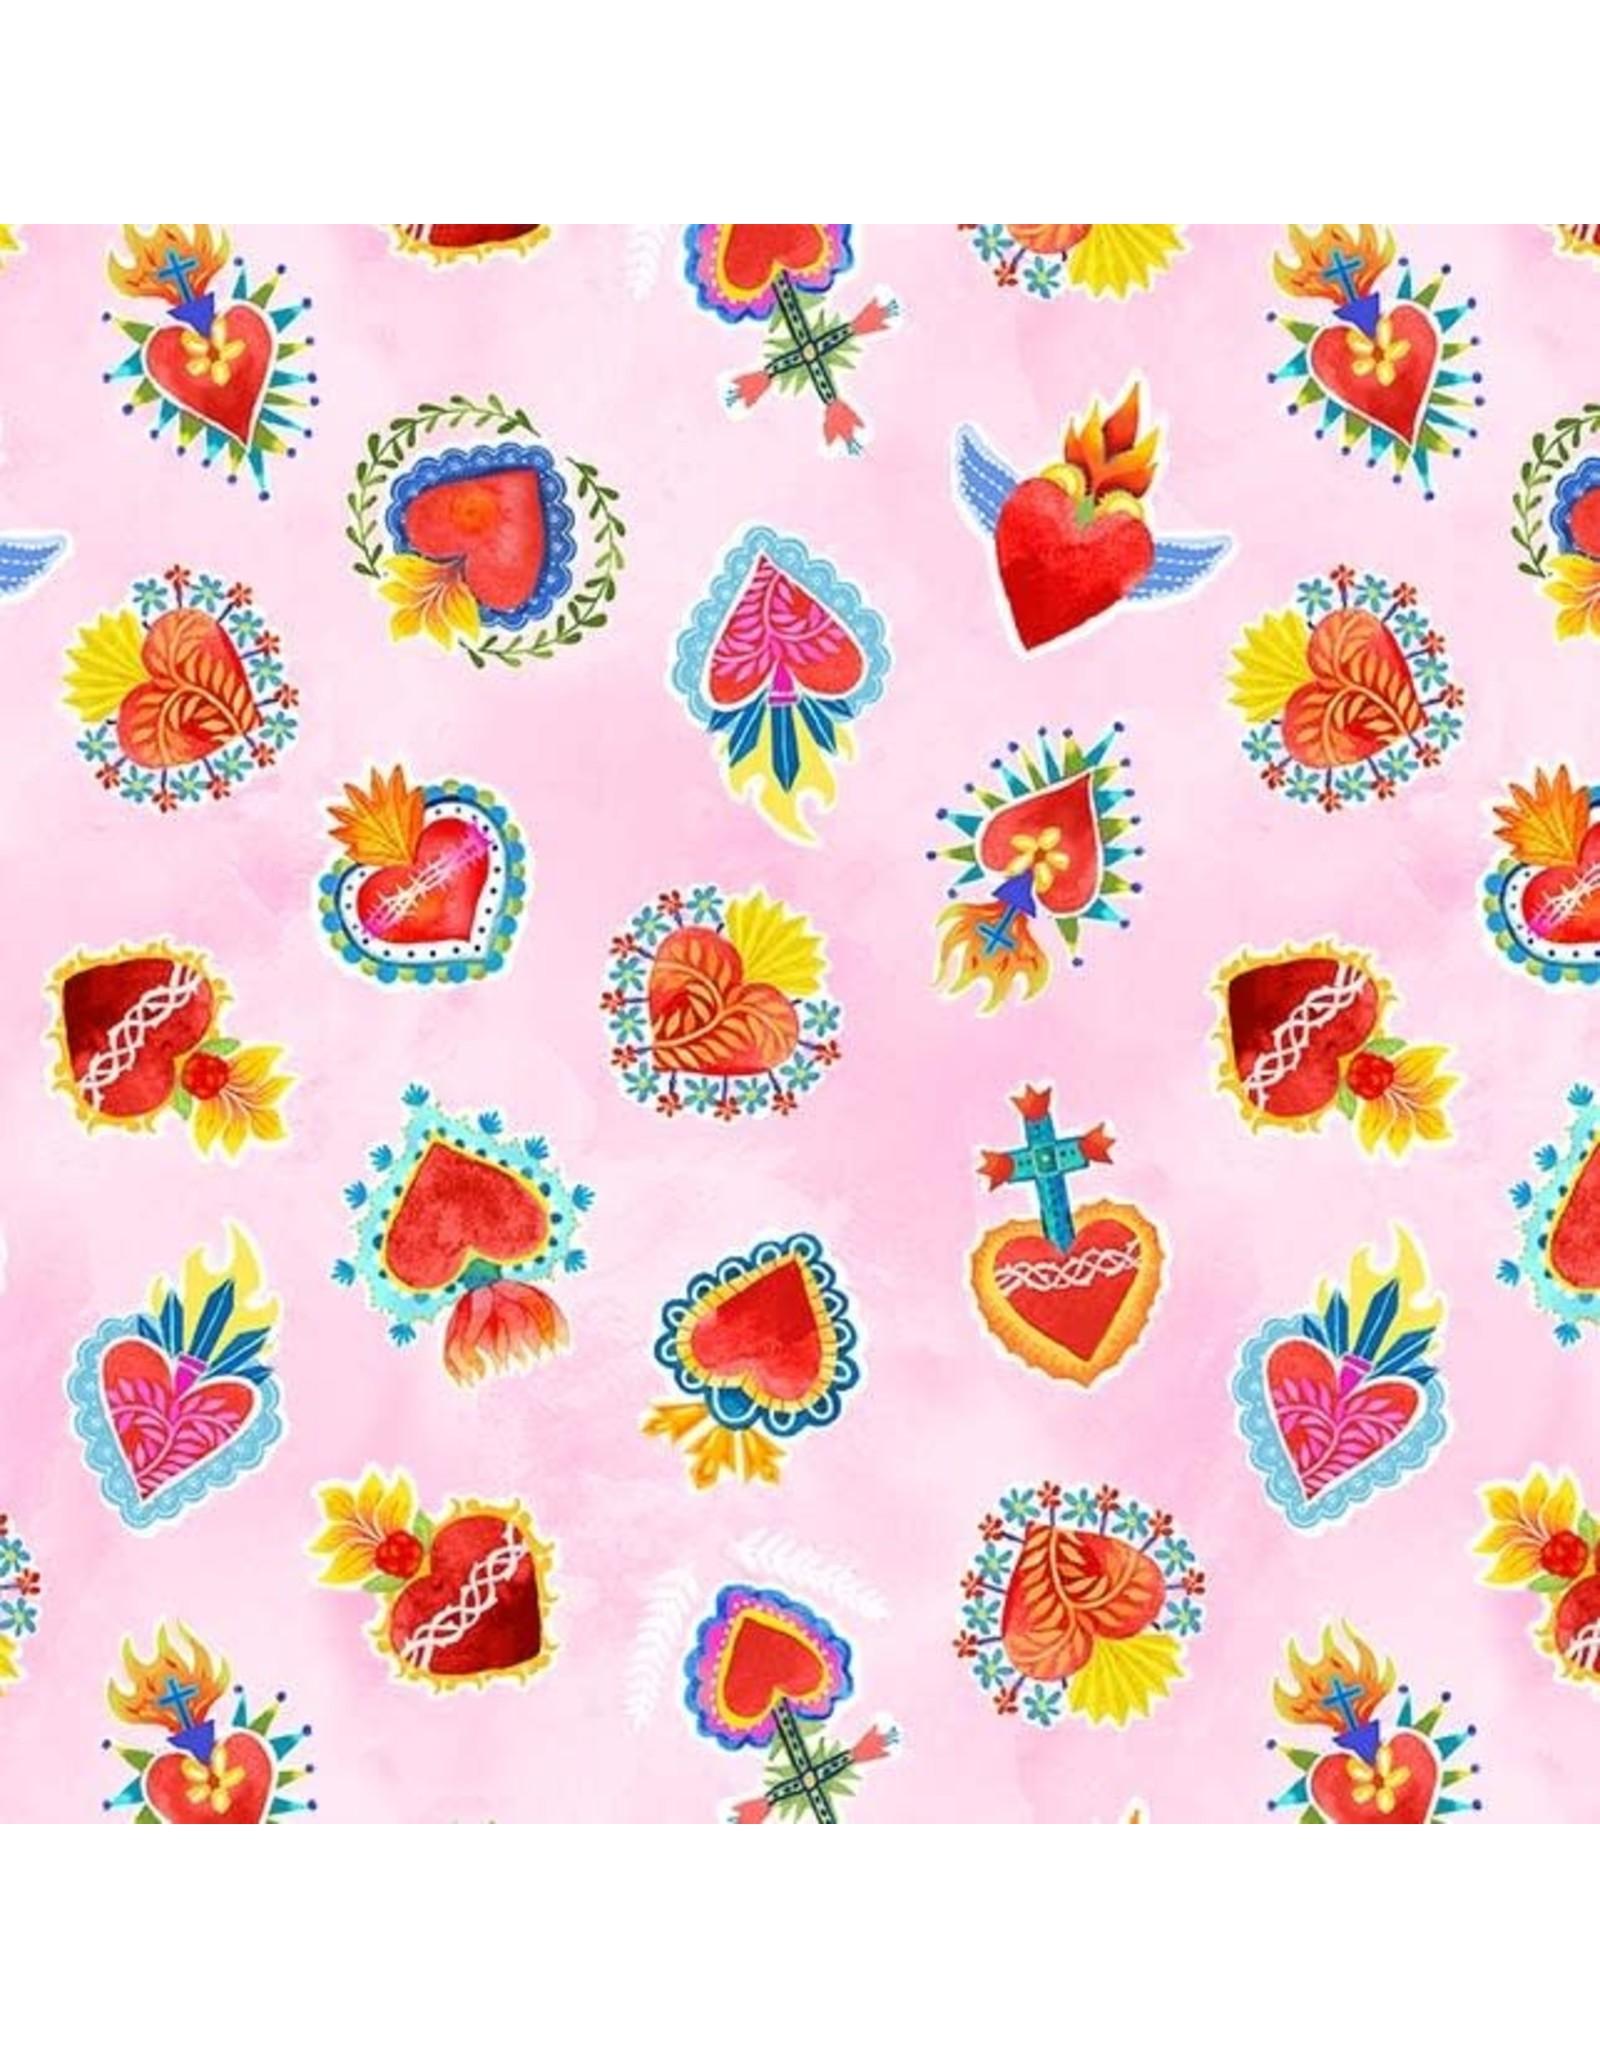 Michael Miller La Vida Loca, Sacred Heart in Pink, Fabric Half-Yards